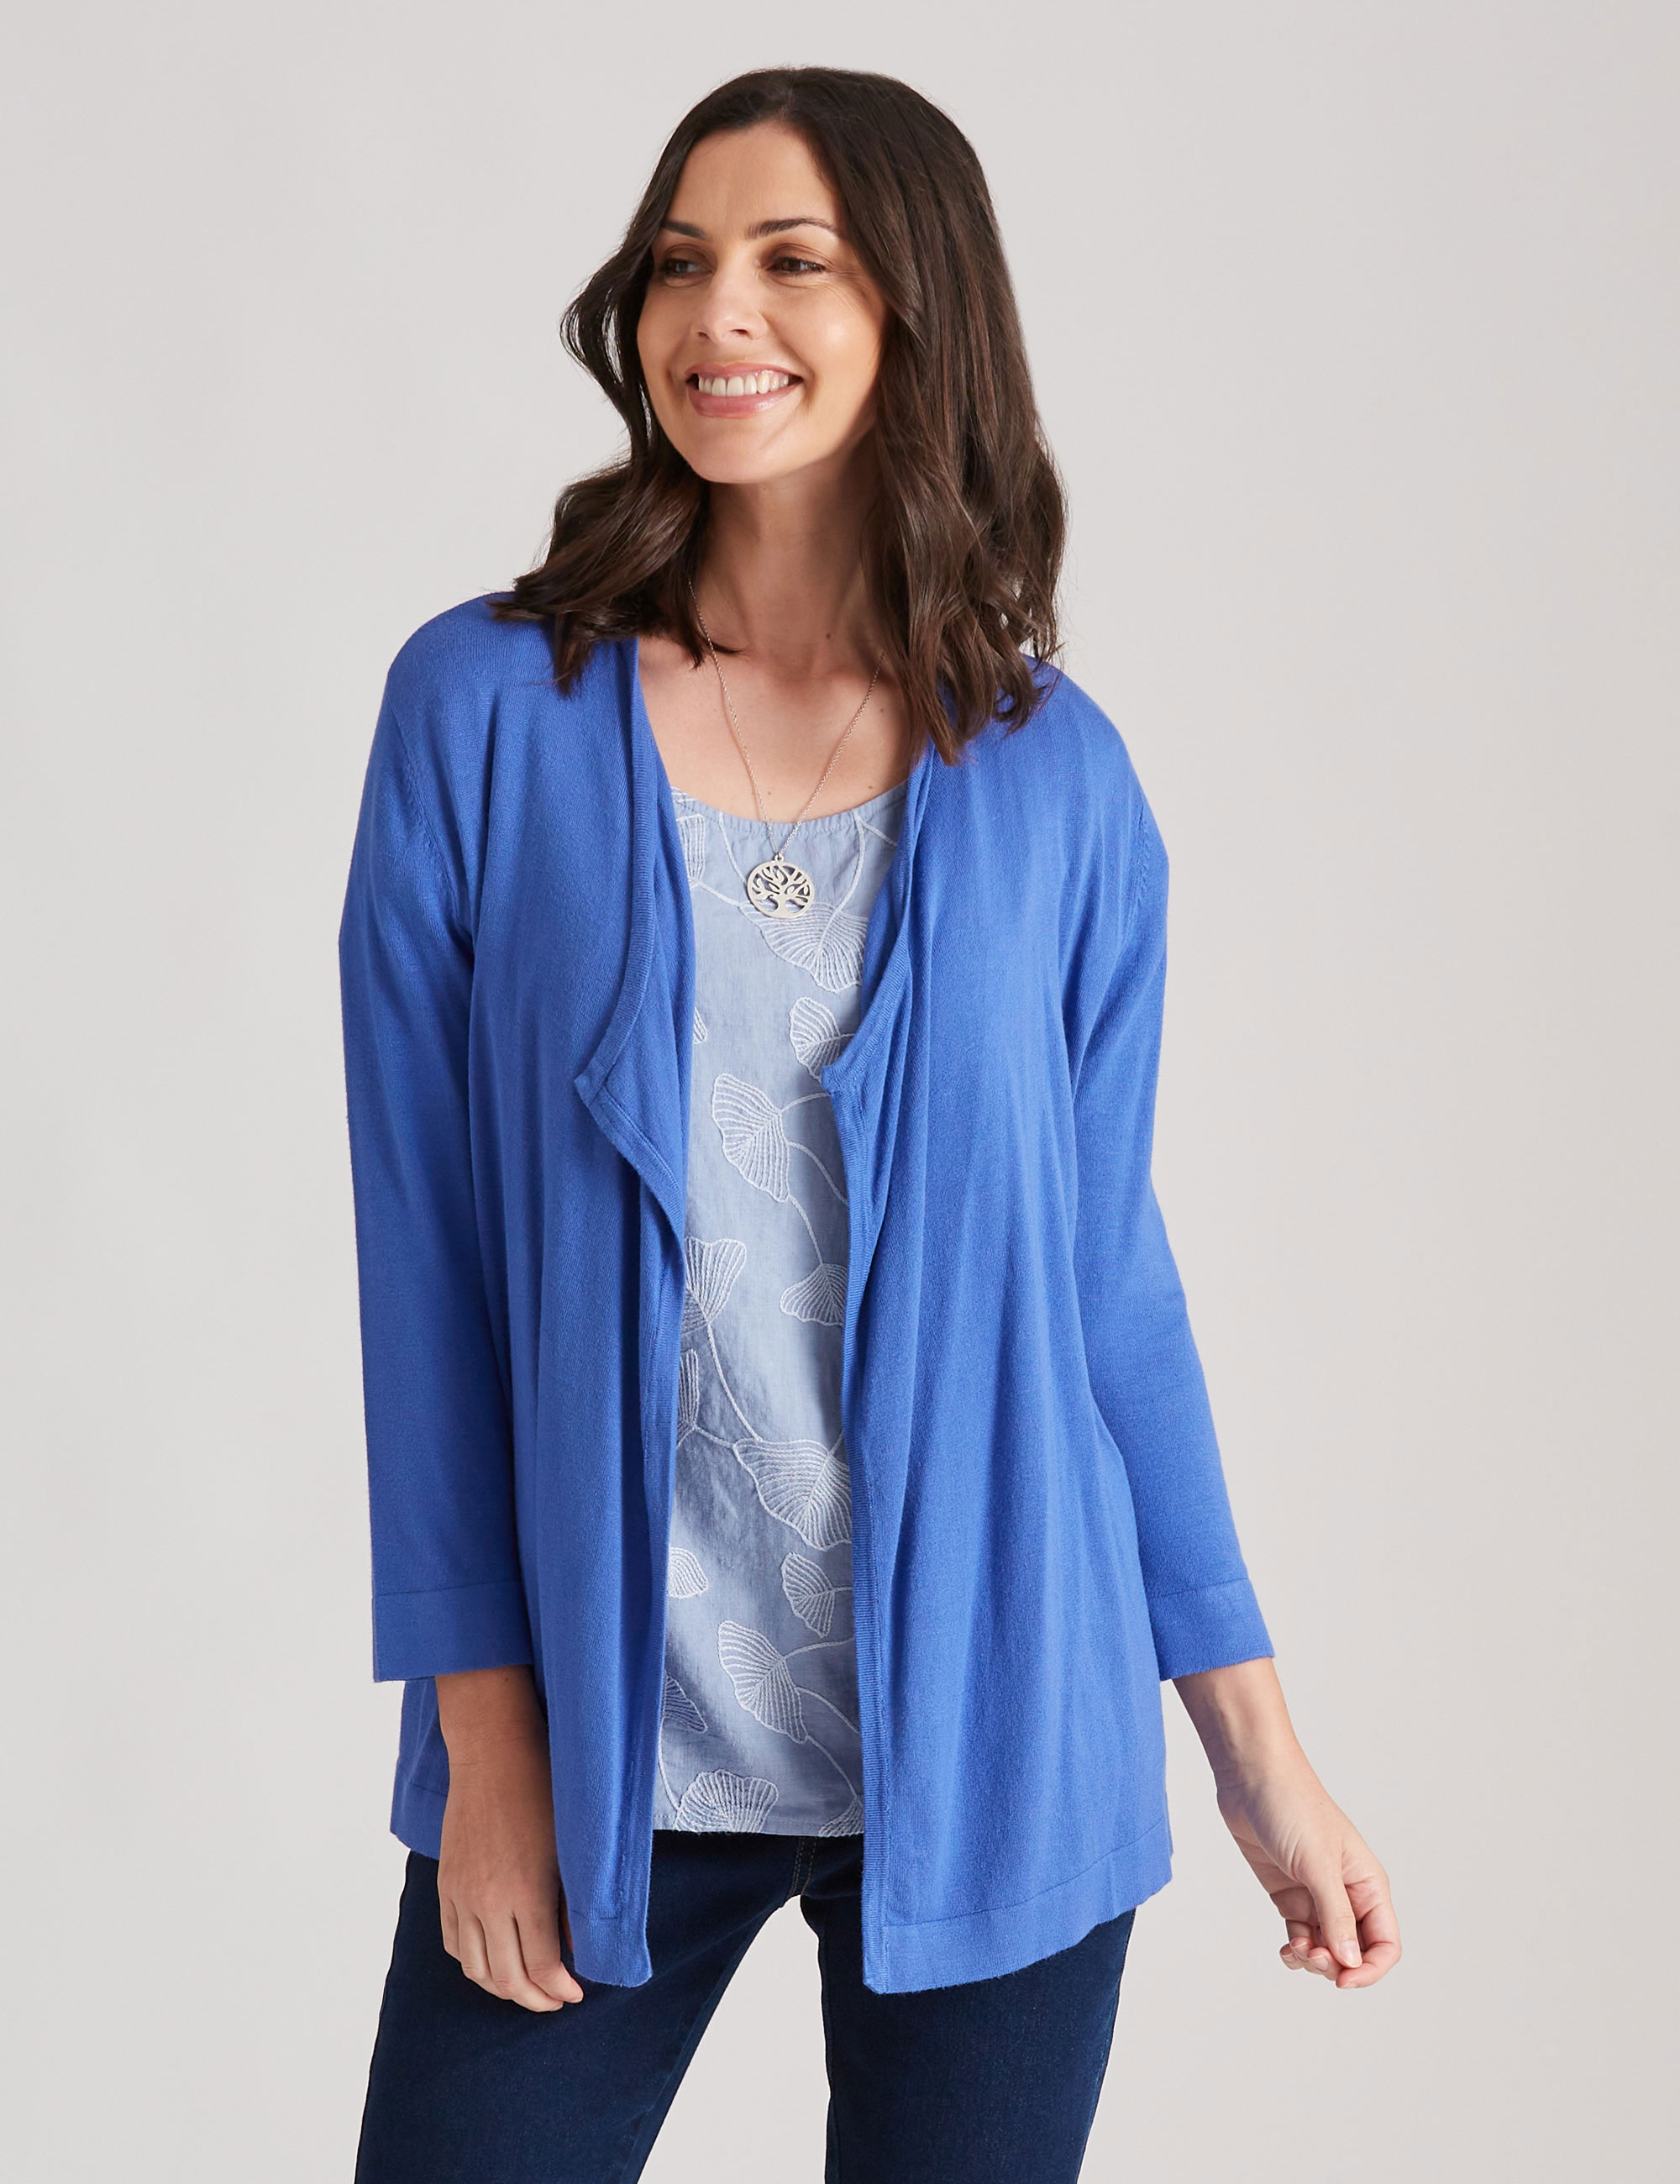 1056104420 1 - Women Fashion